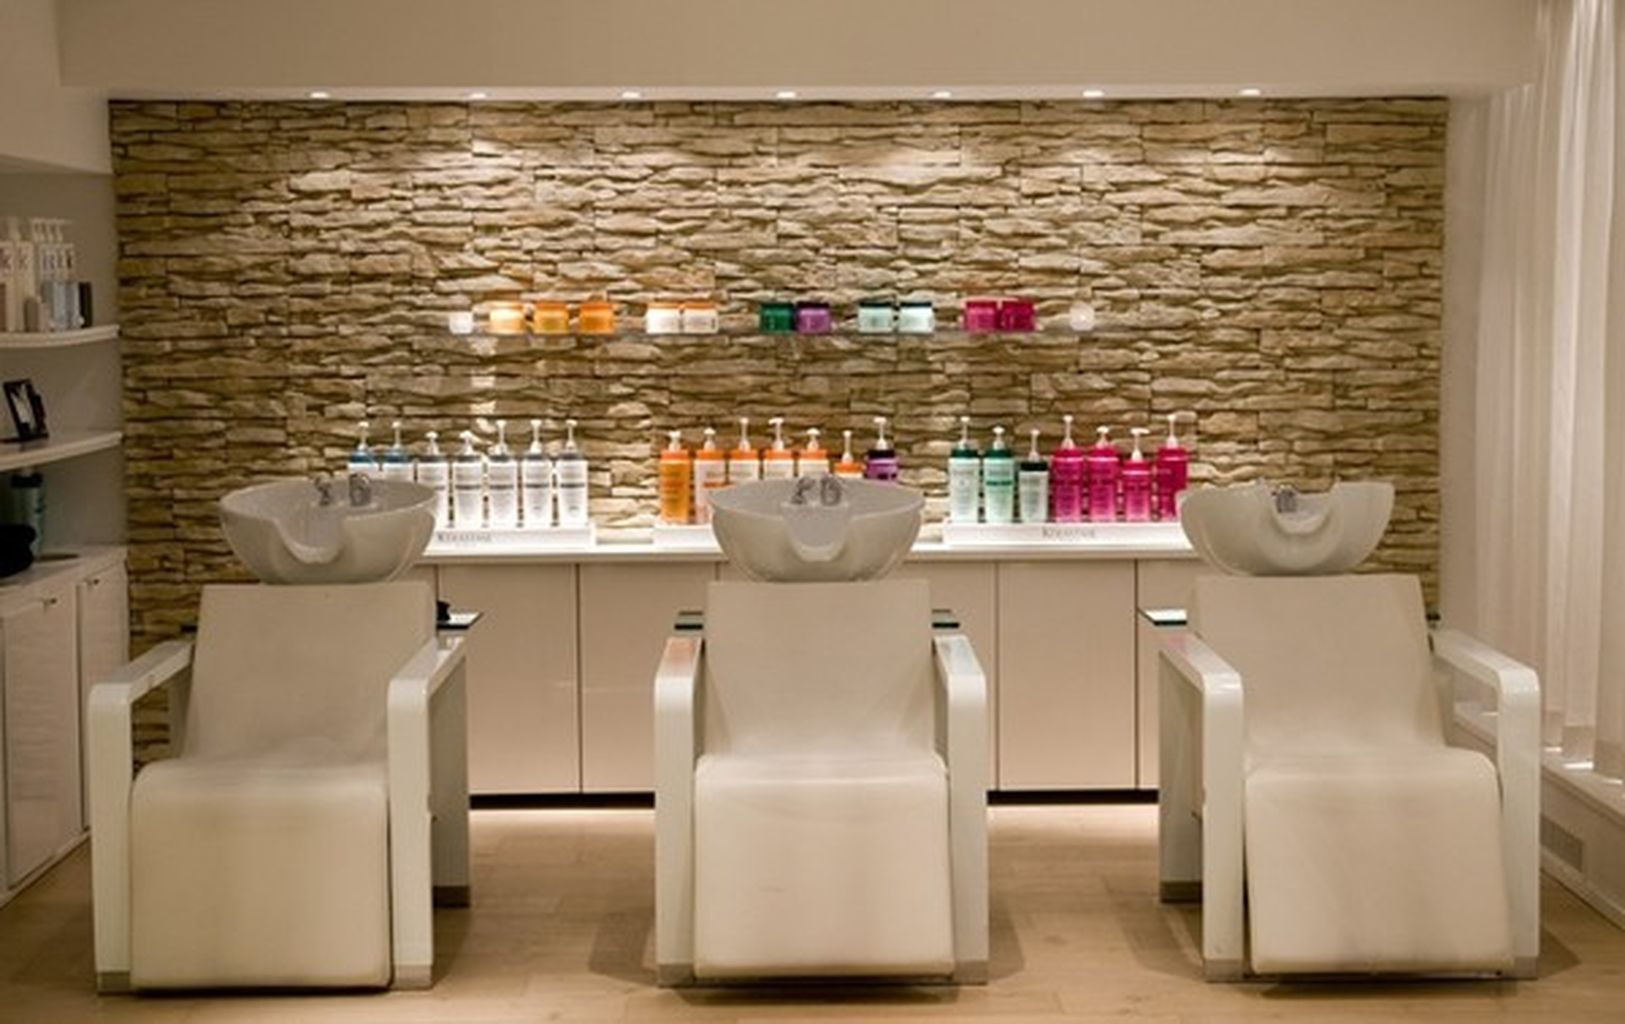 50 Hair Salon Ideas Hair Salon Decor Hair Salon Design Hair